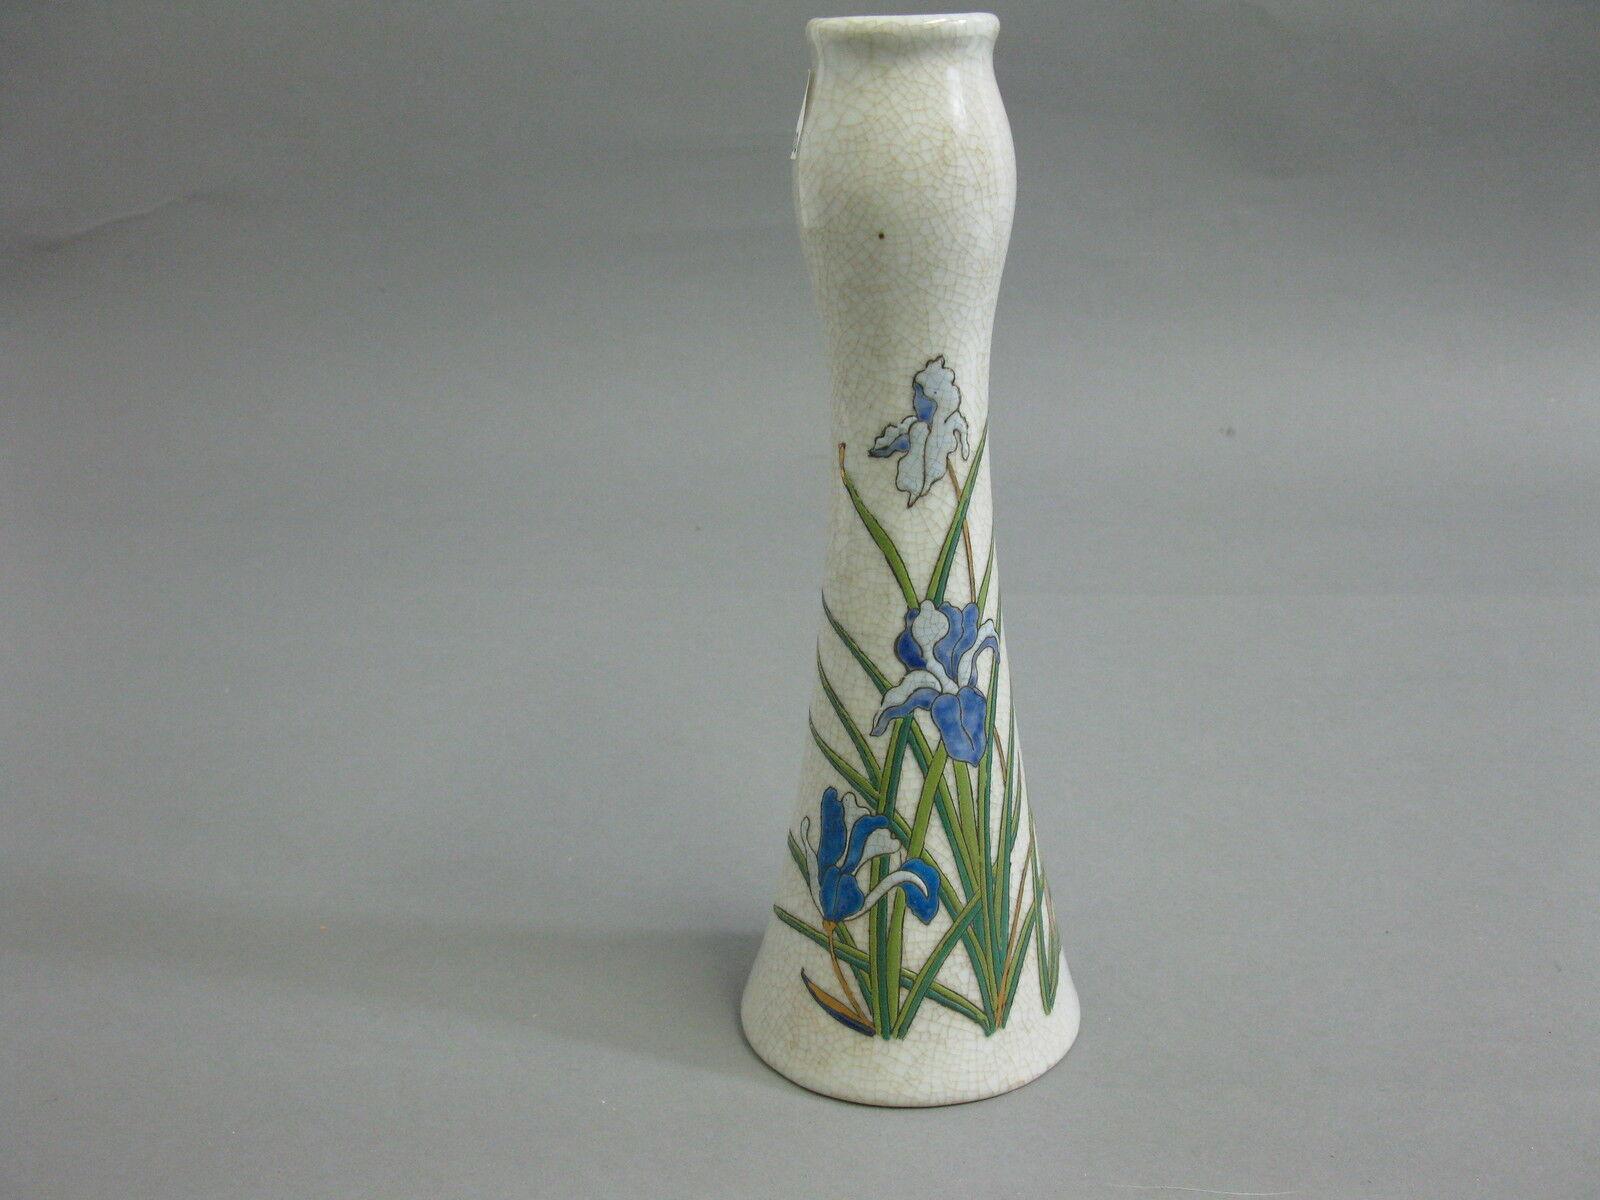 Porzellan Vase 20 cm im Antikstil